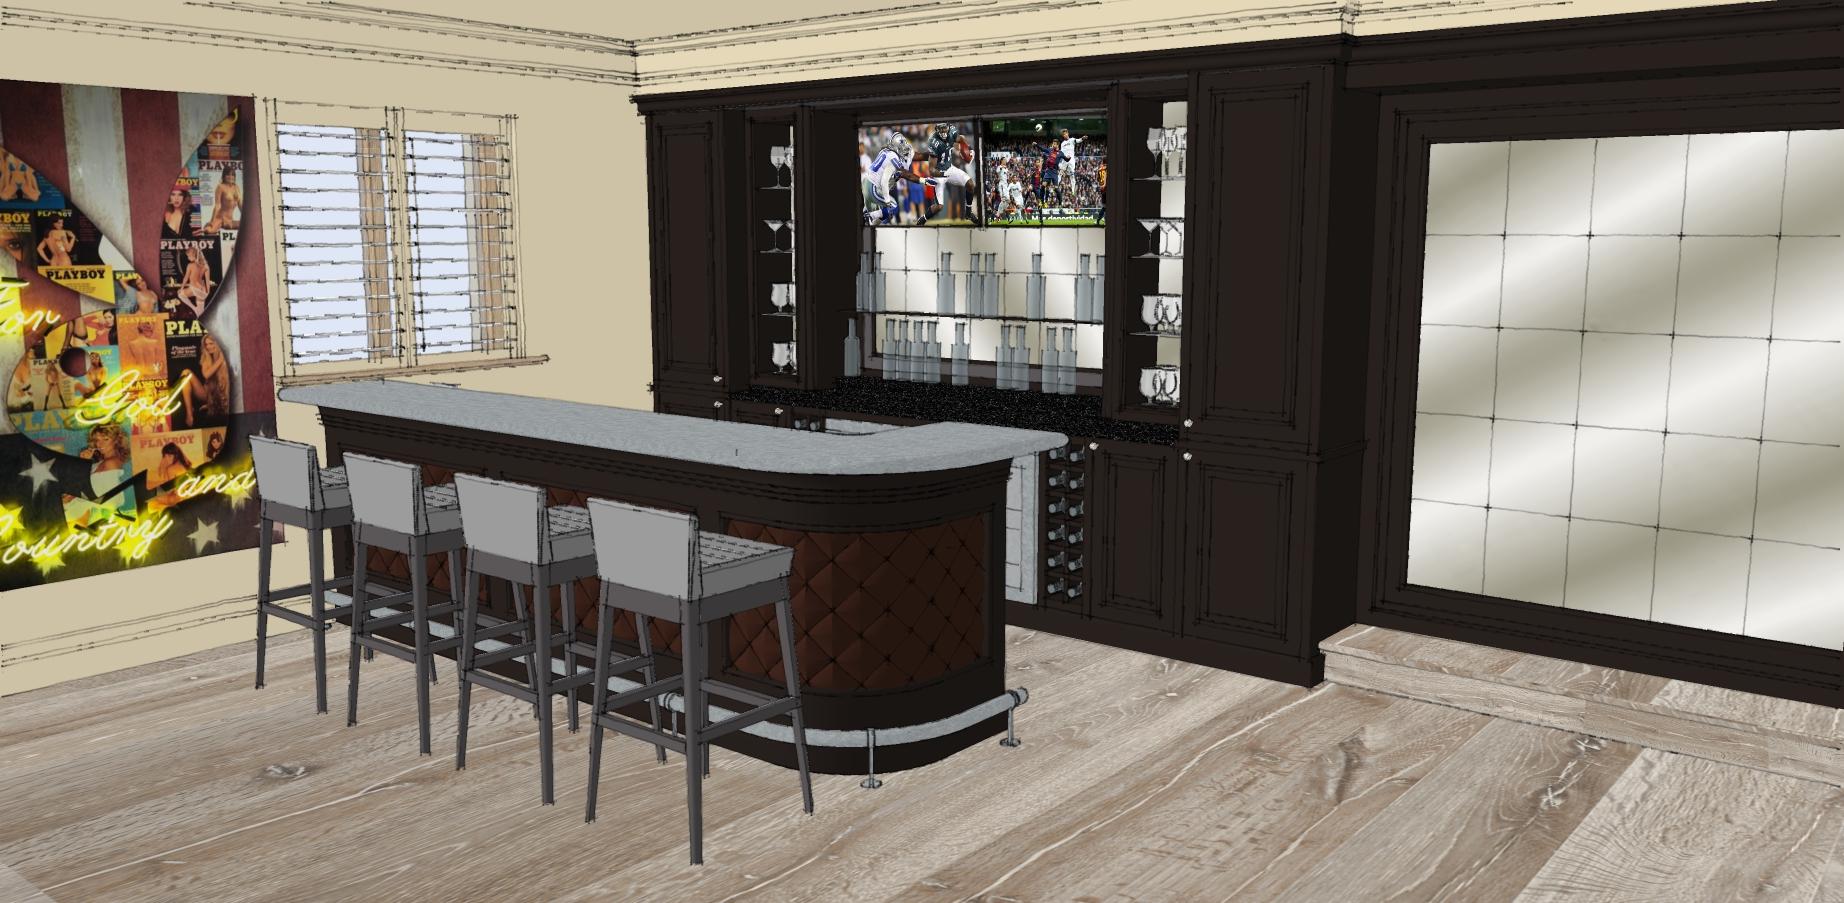 Bespoke Bar design render